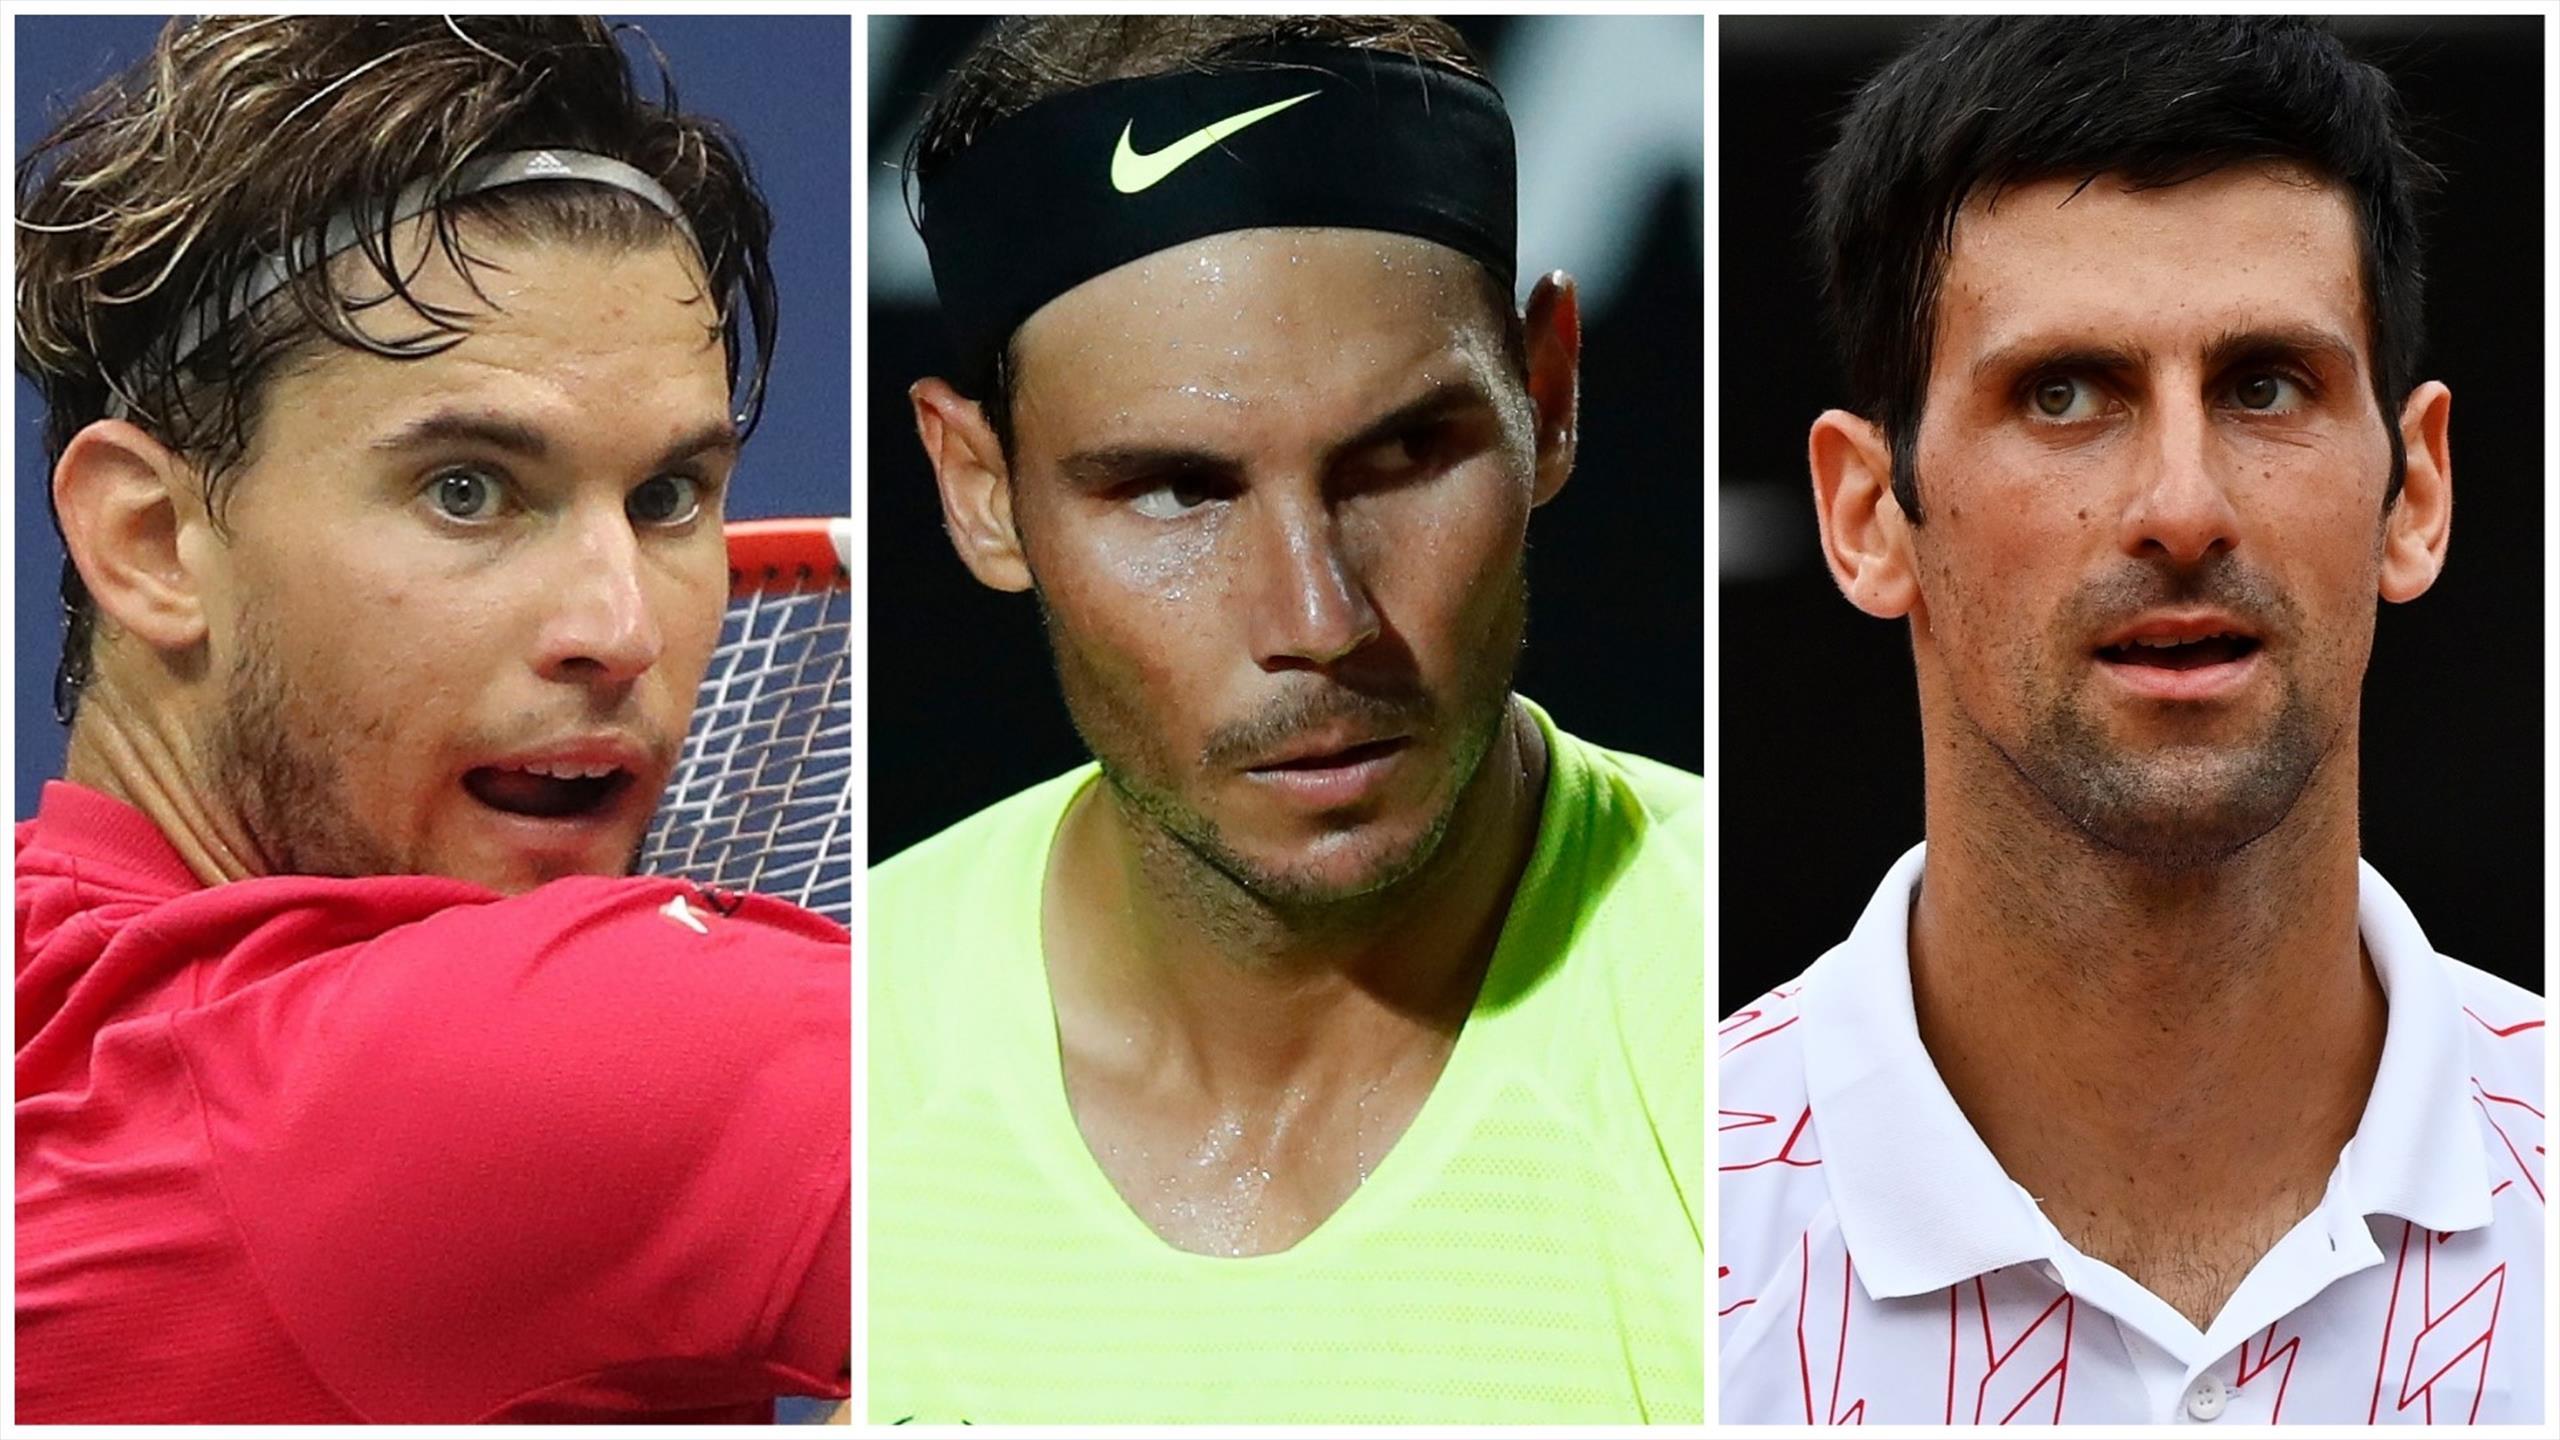 Roland Garros 2020 Rafael Nadal V Novak Djokovic V Dominic Thiem Who Is The French Open Favourite Eurosport